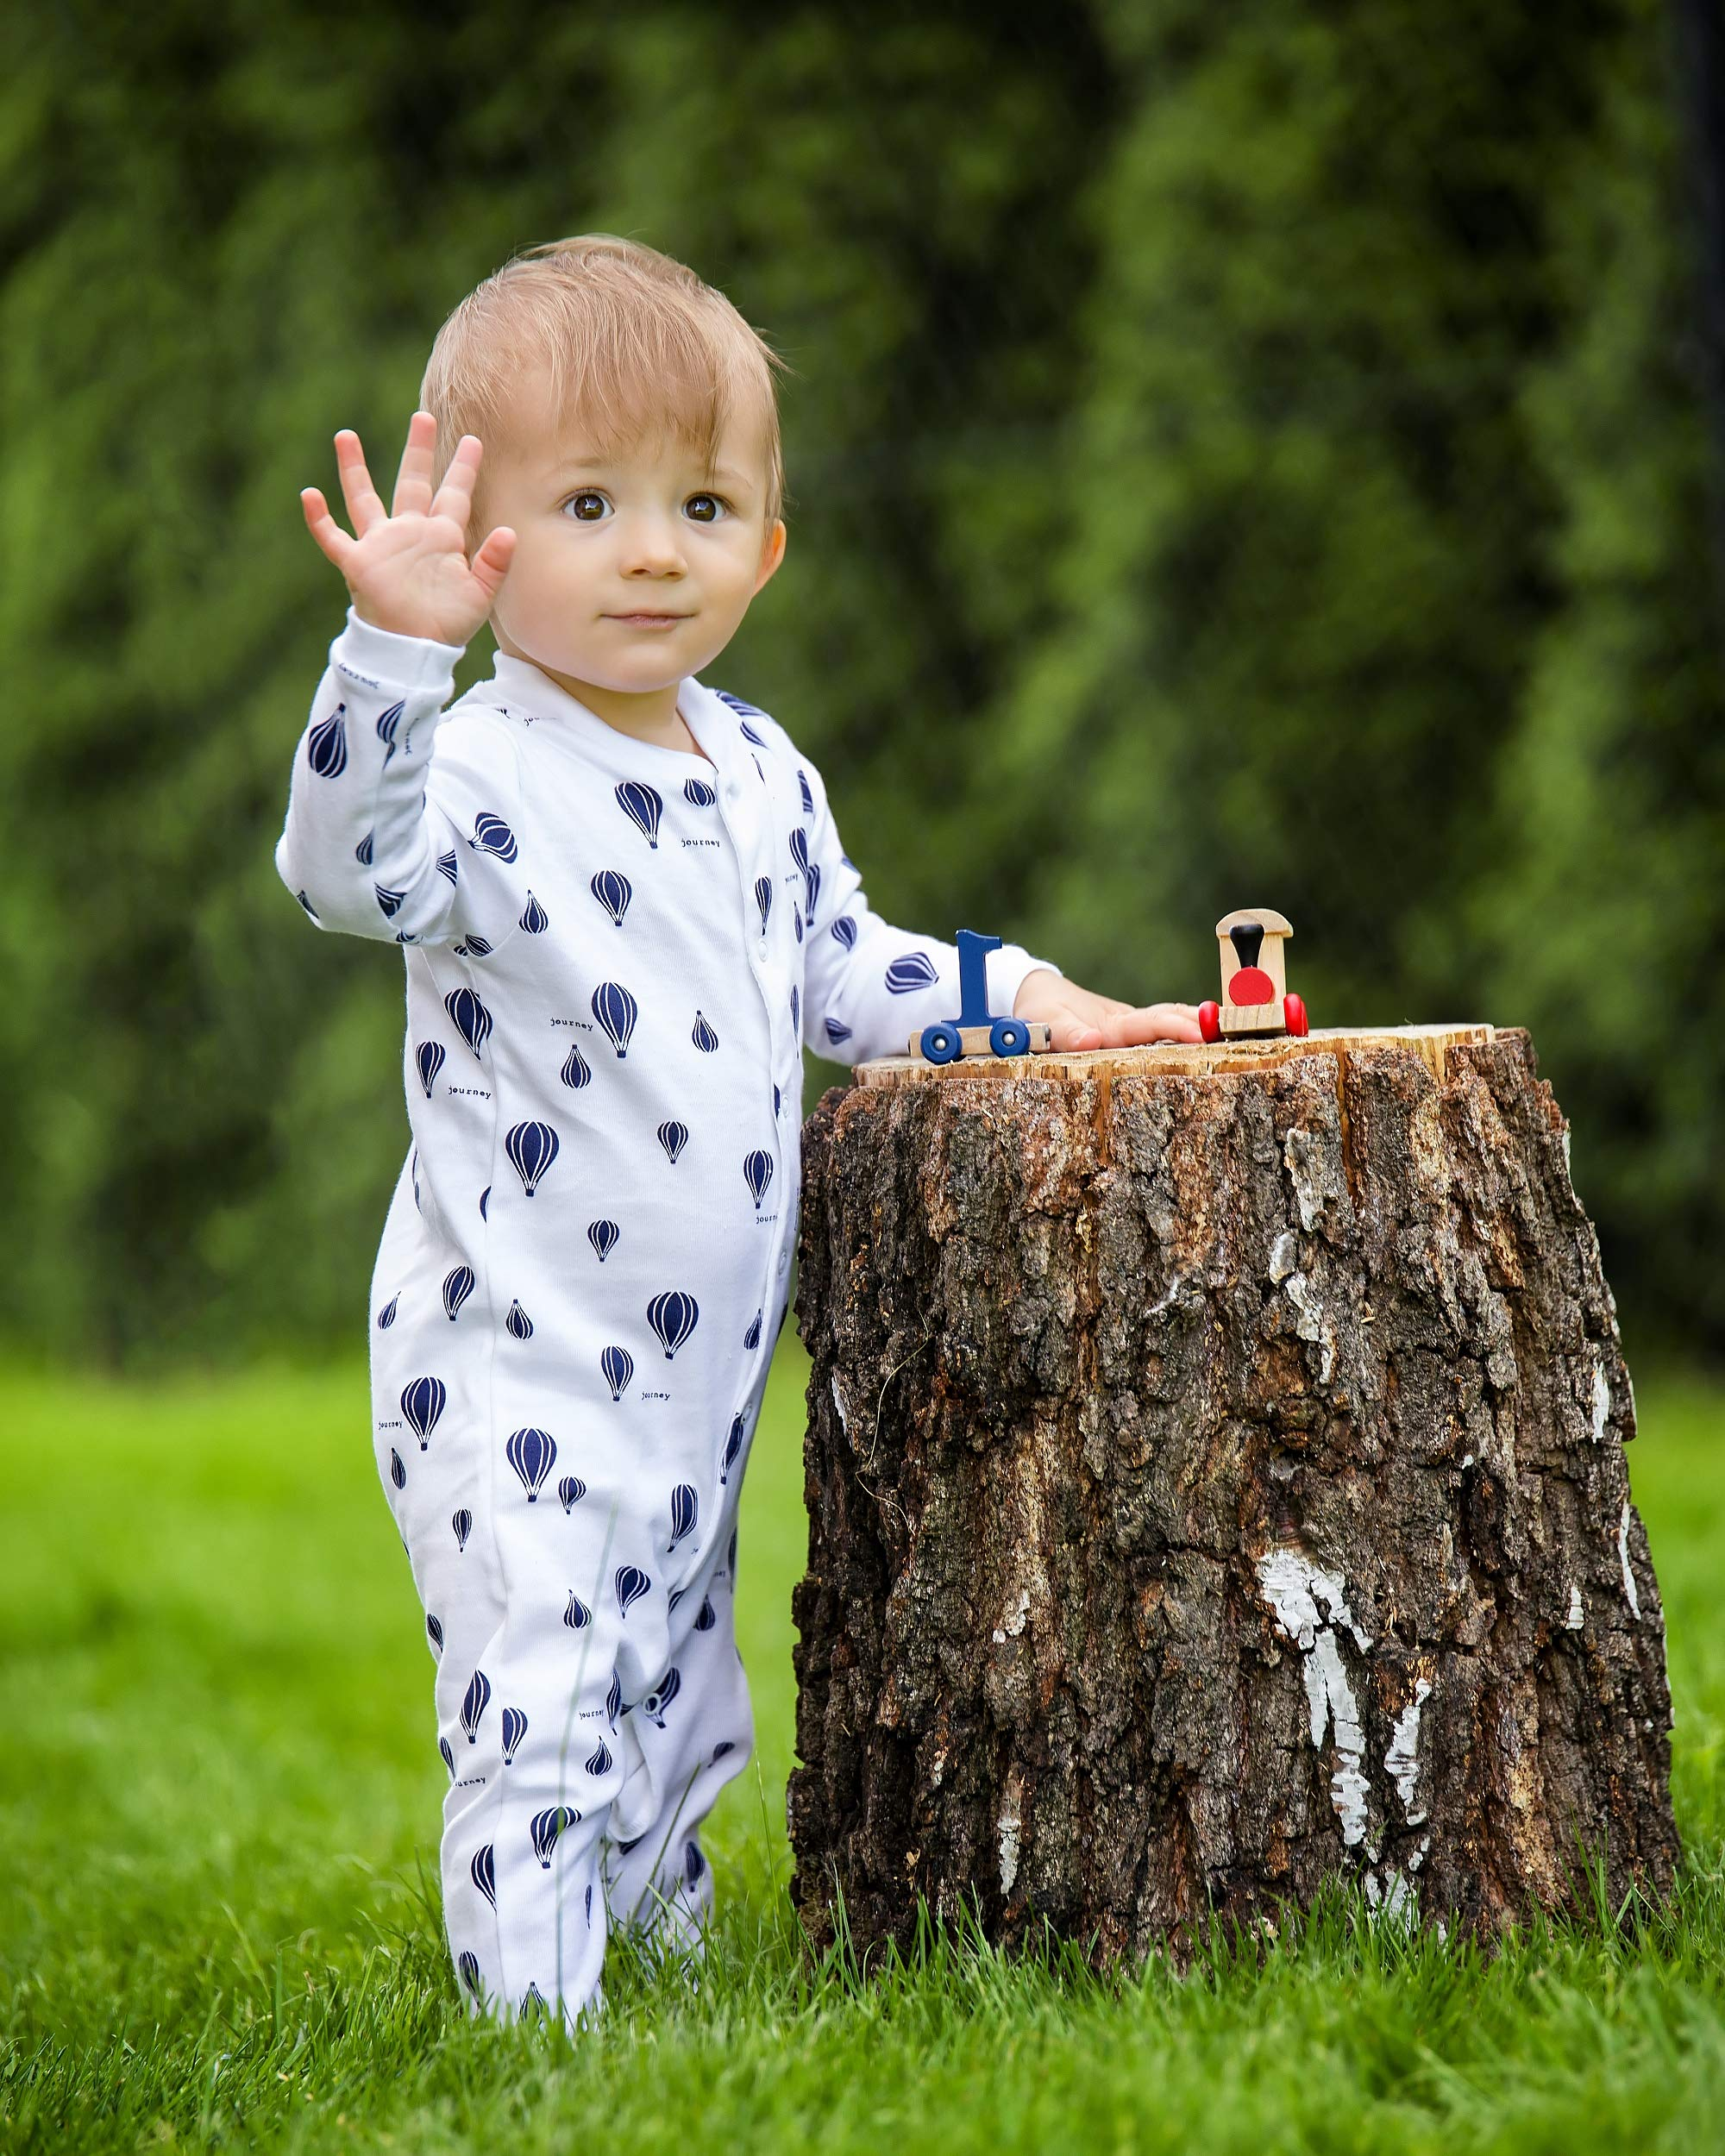 Sibinulo Niño Niña Pijama Bebé Pelele de Algodón- Tamaños 56-74 - Pack de 3 7